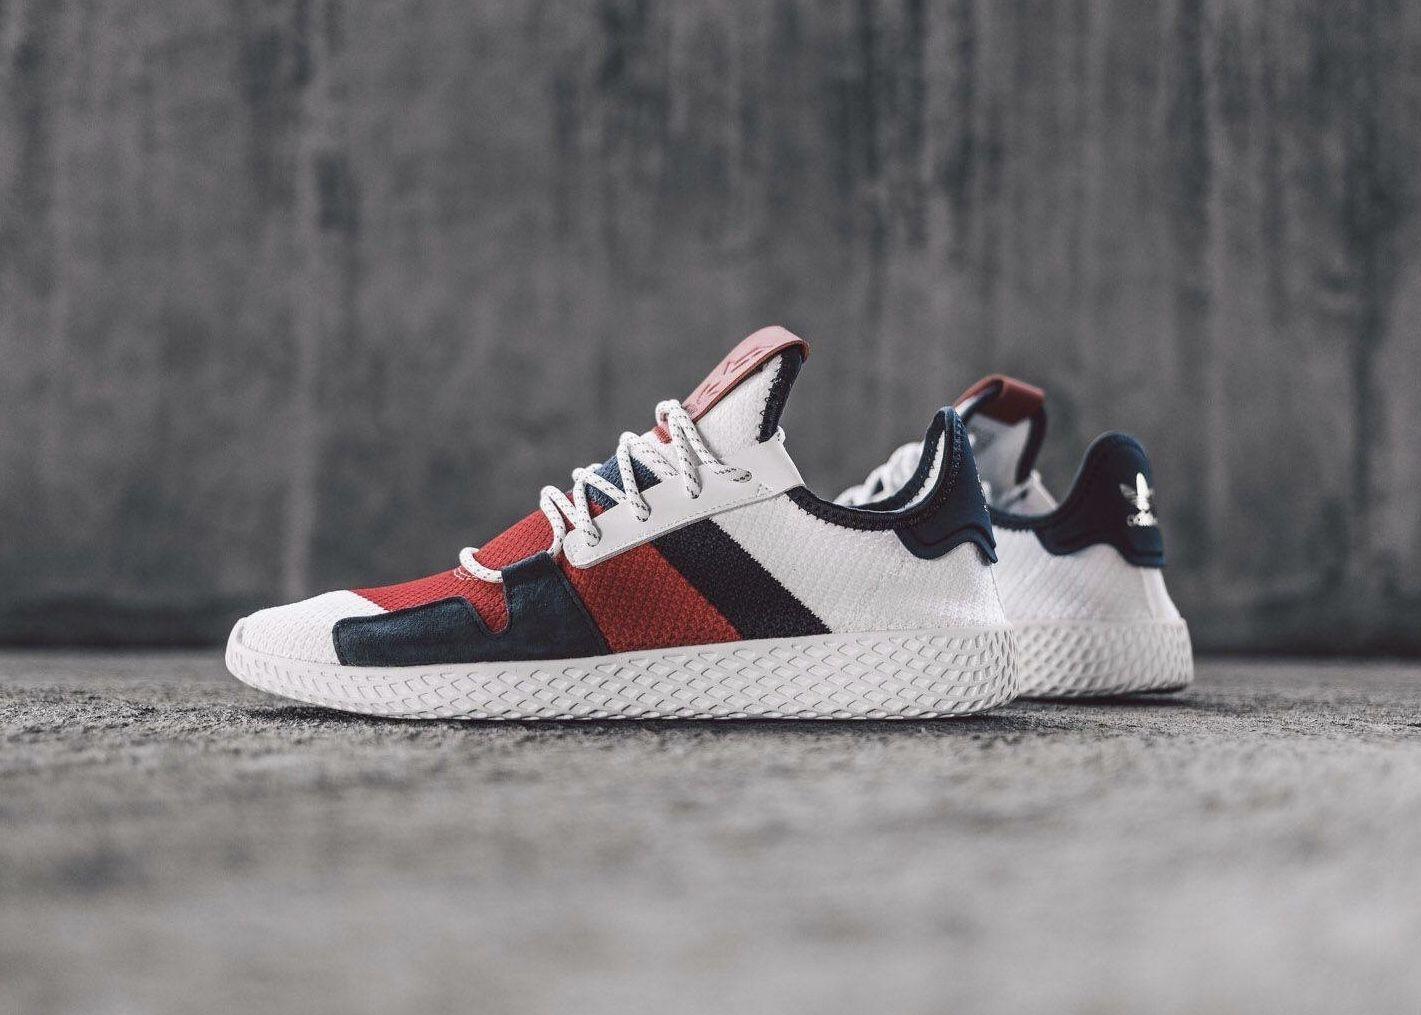 cheap for discount 864f6 73d5e Pharrell x adidas Originals Tennis Hu   Fodtøjet   Sneakers, Shoes ...